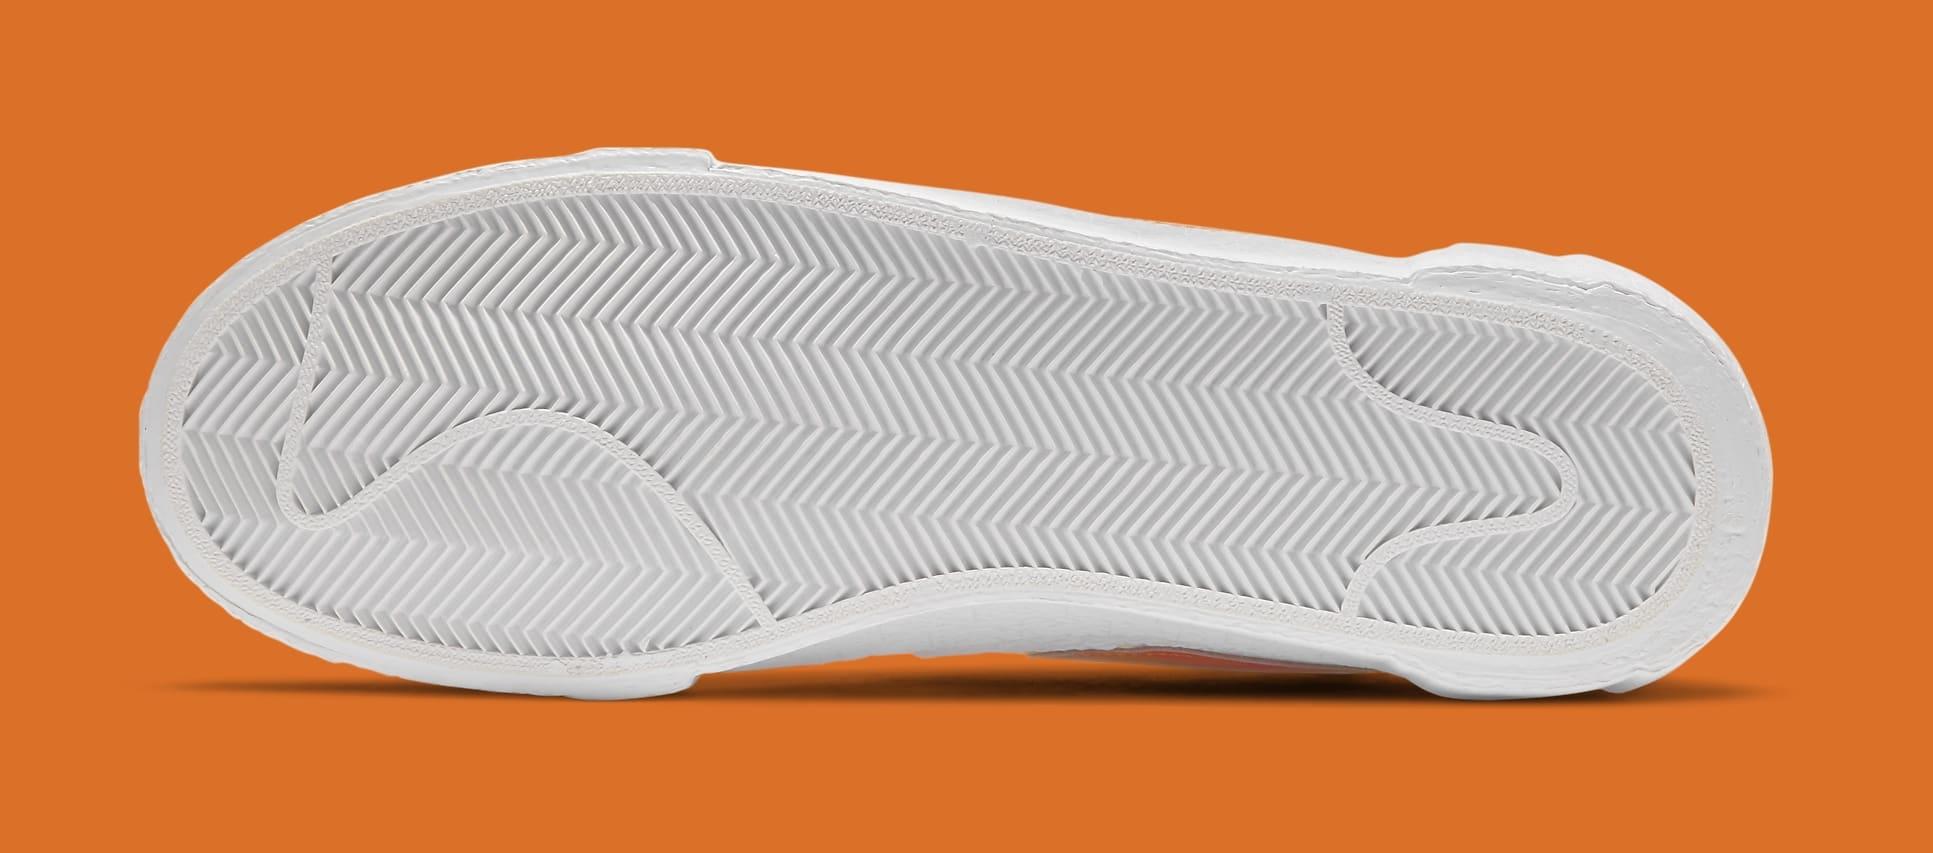 Sacai x Nike Blazer Low 'Magma Orange' DD1877-100 Outsole